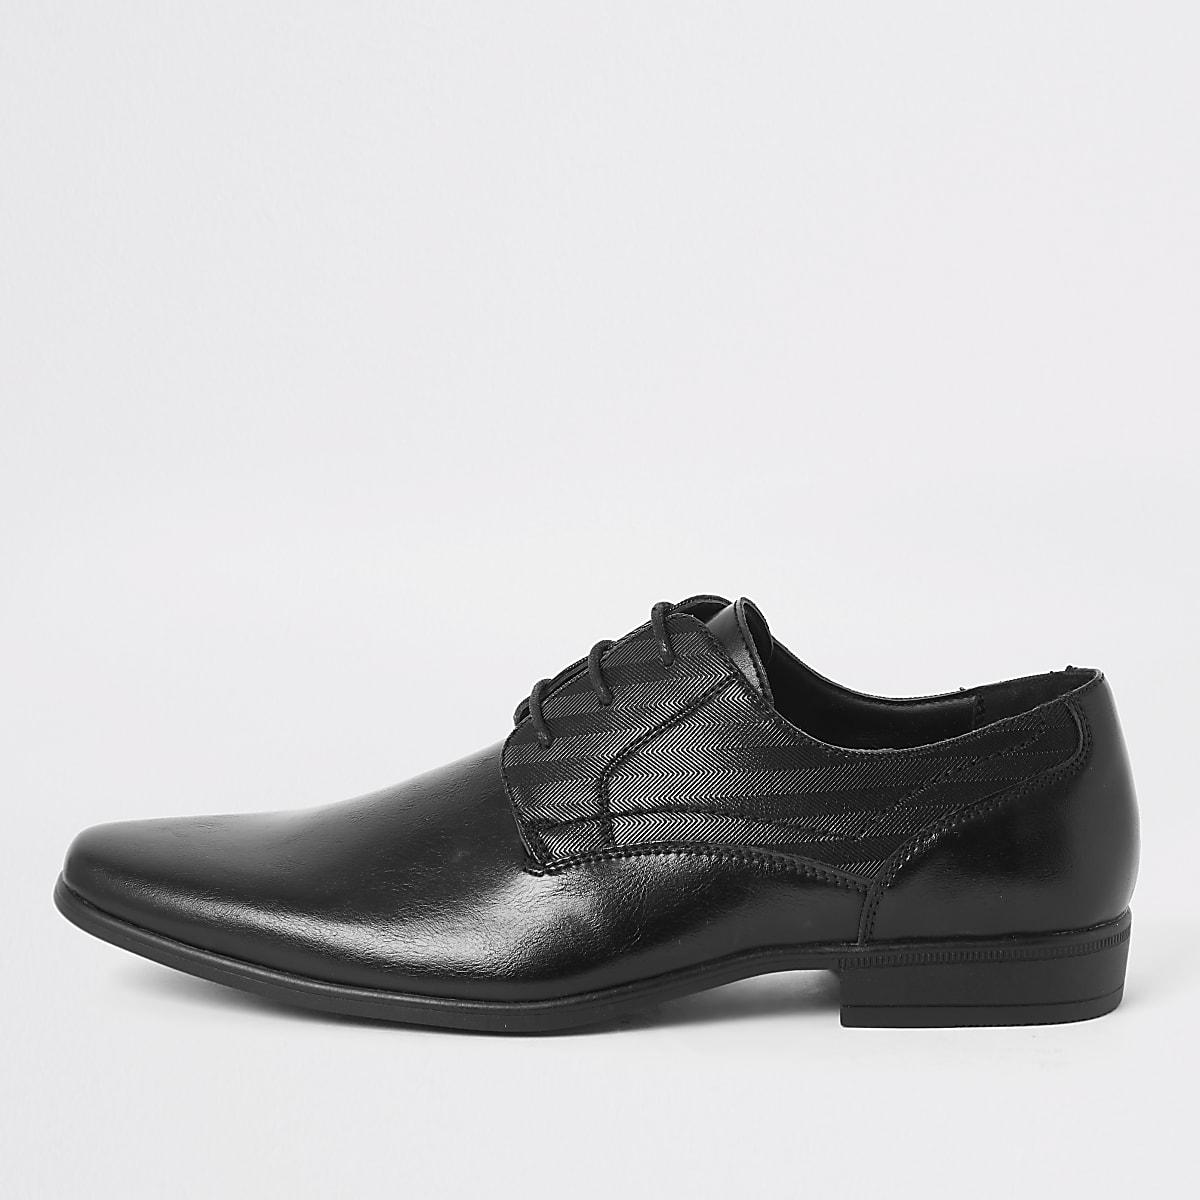 Black embossed derby shoes